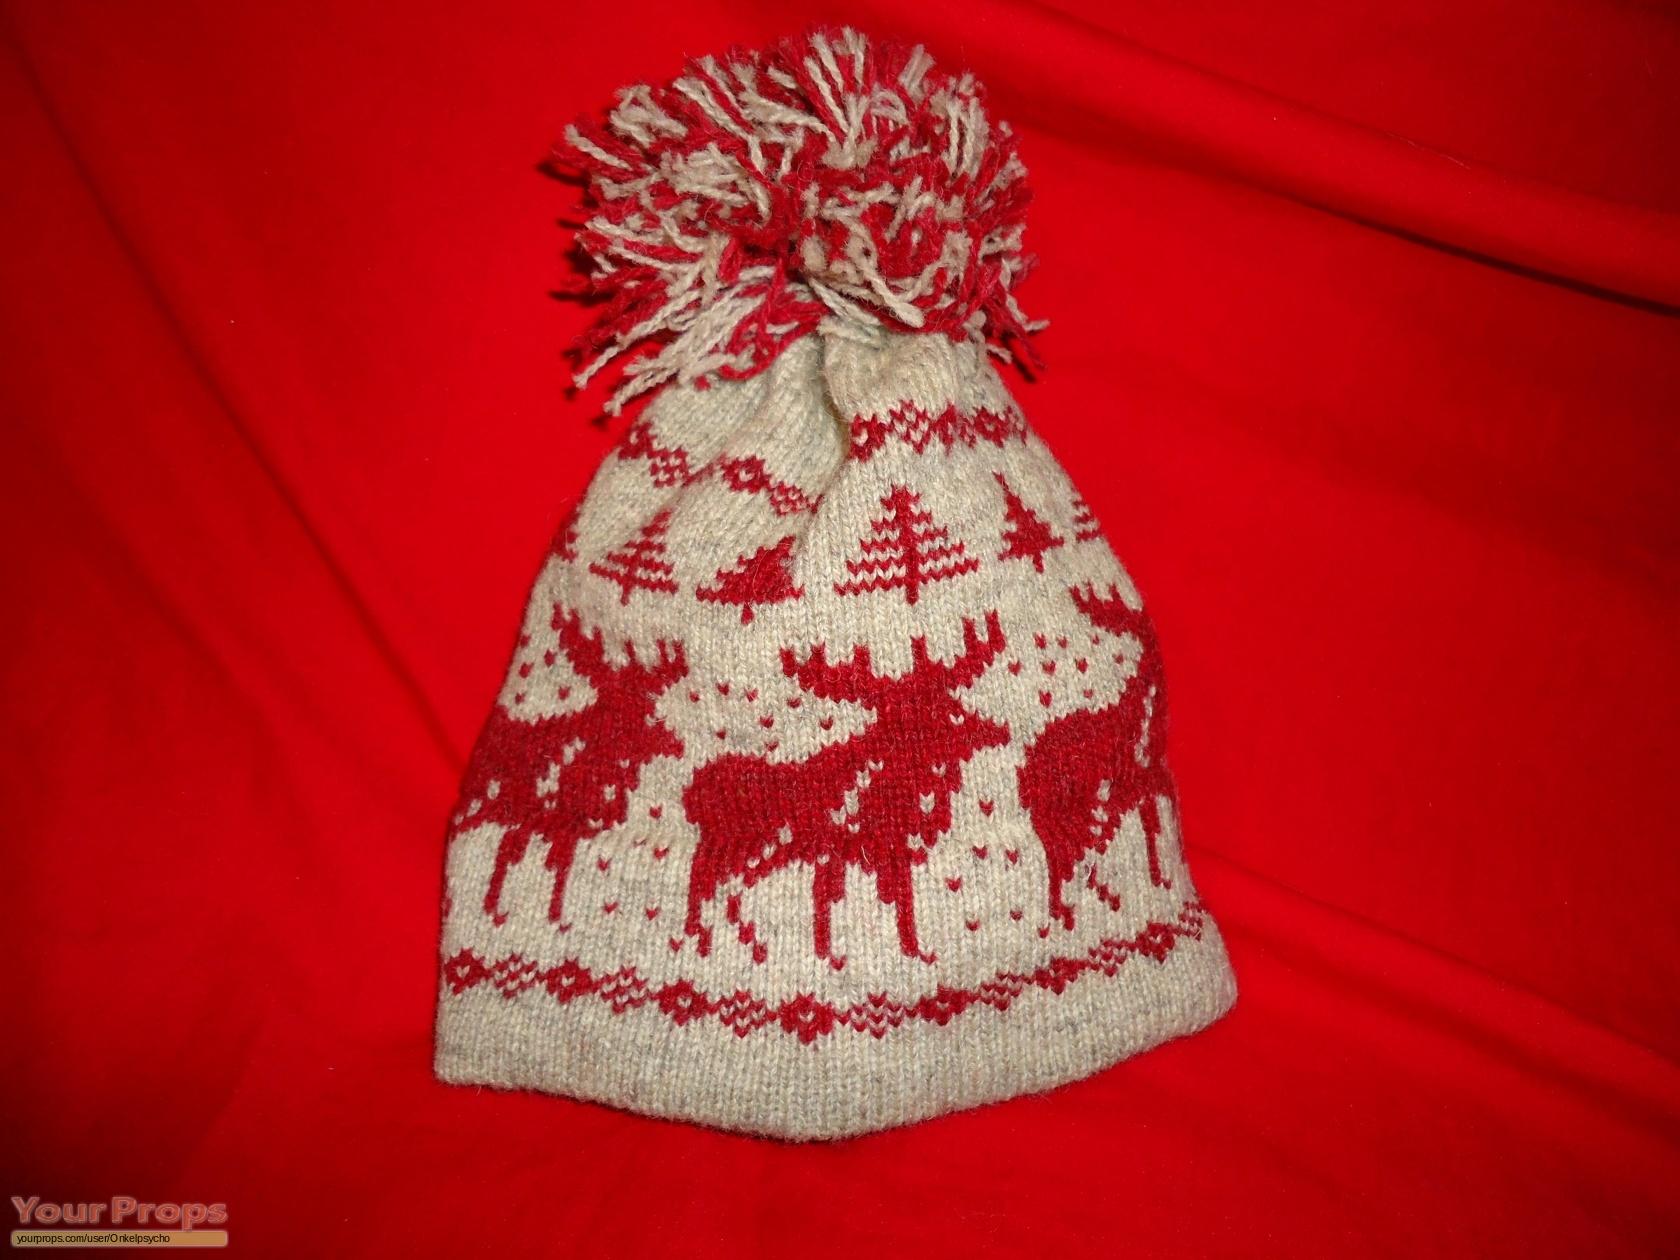 Home Alone Kevin s Wool Hat replica movie costume 81c3cff5c6f